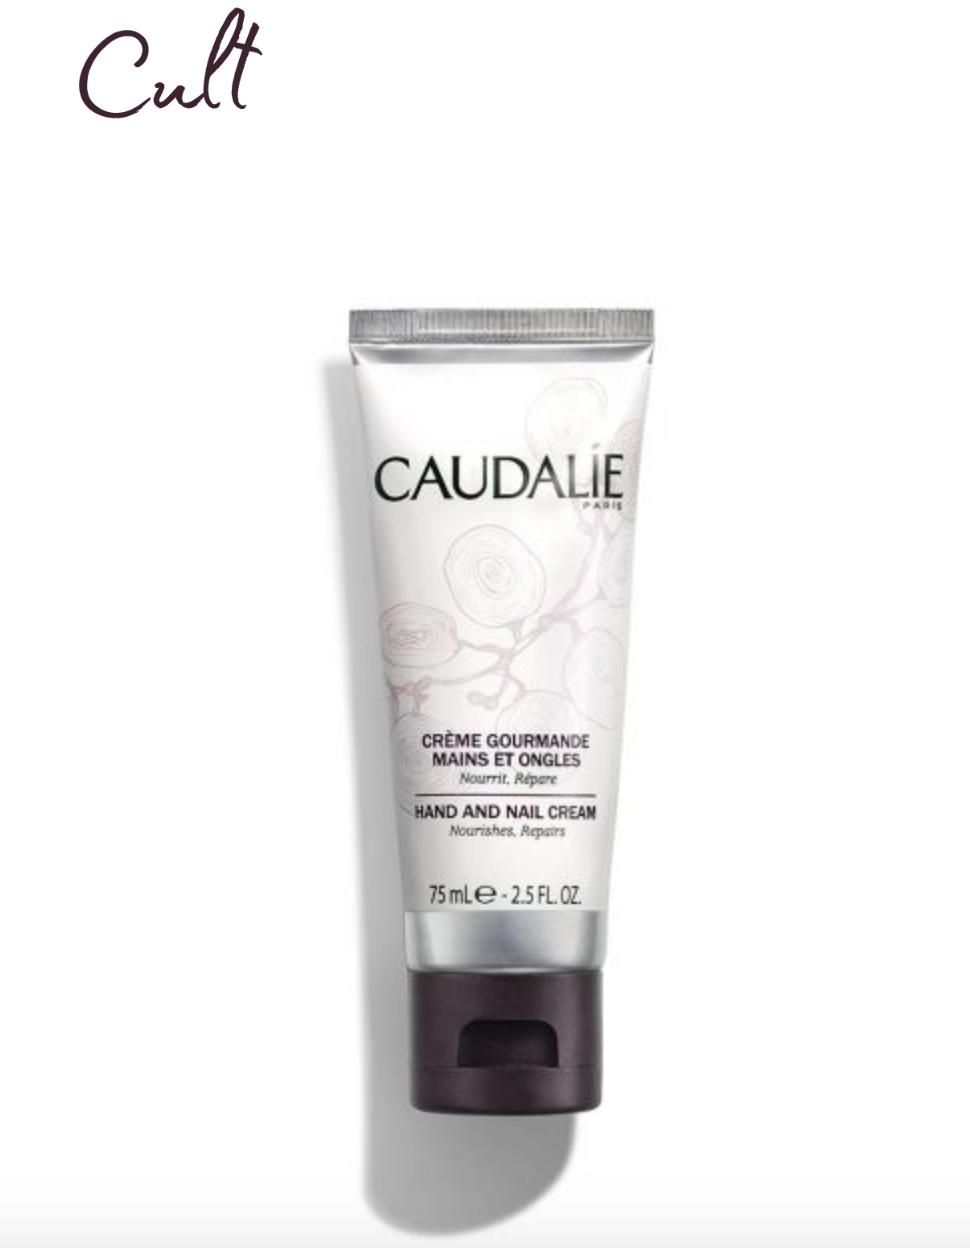 Hand and Nail Cream - Caudalie